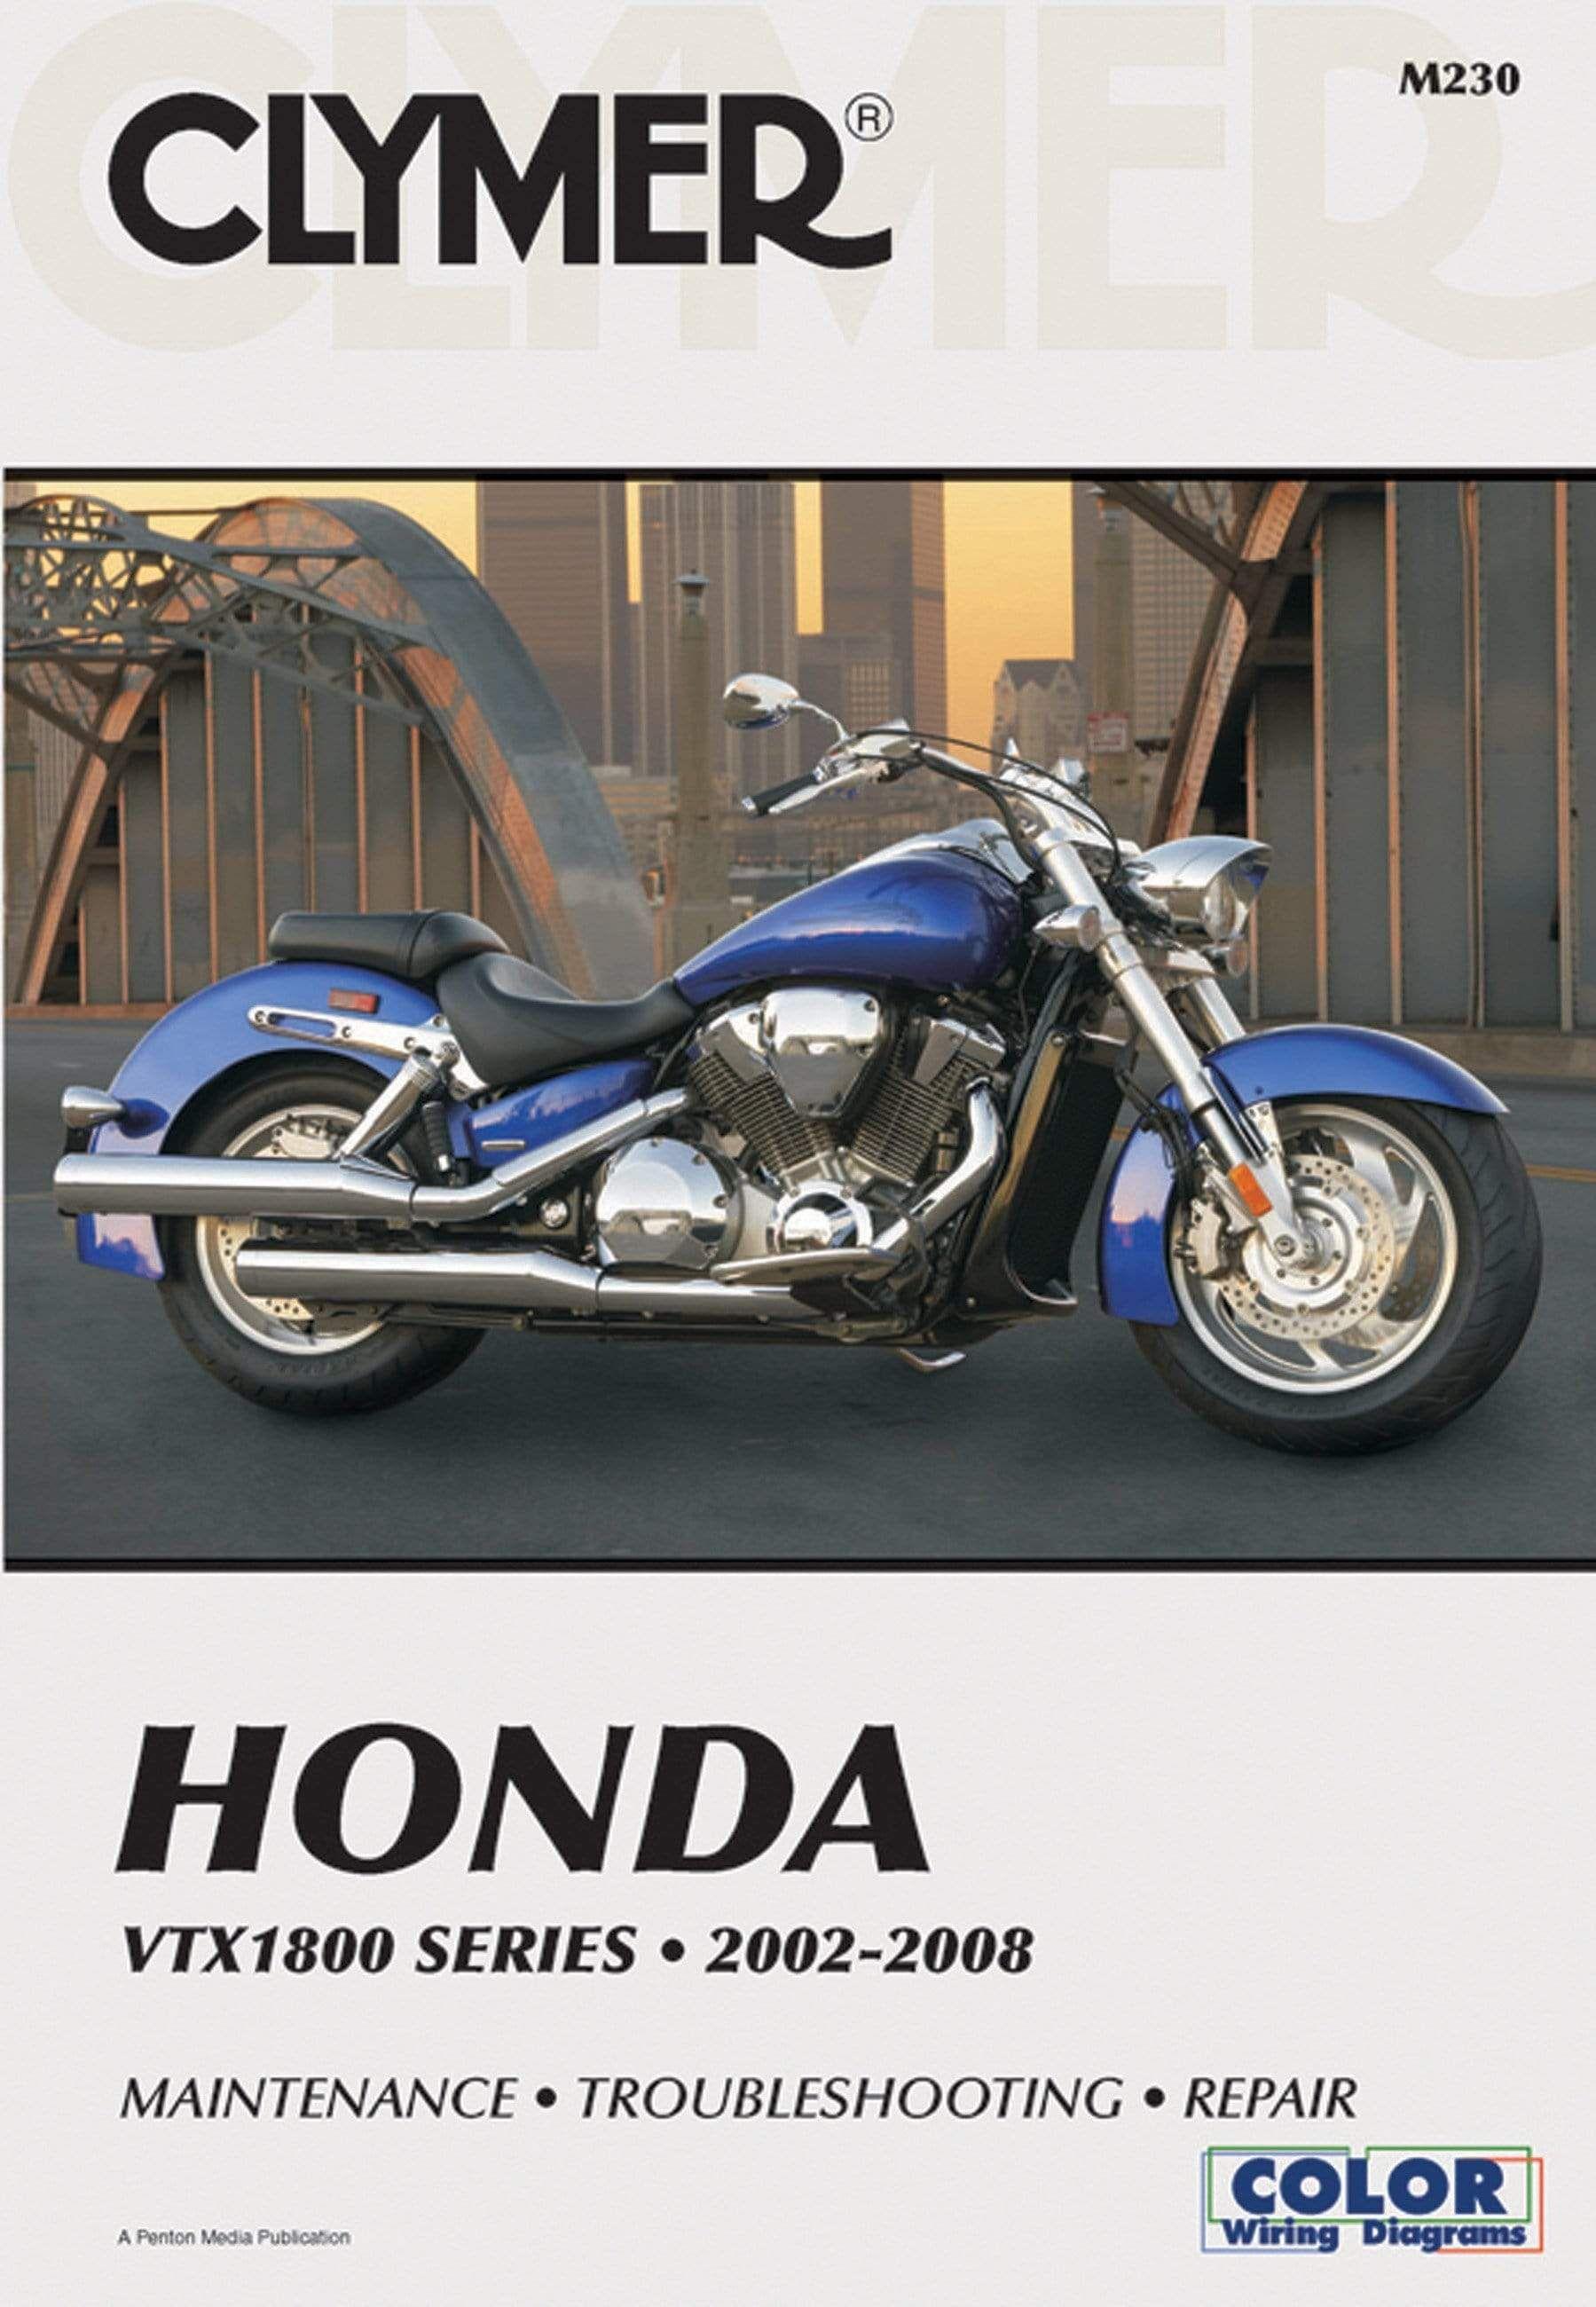 Clymer Honda Vtx1800 Series 2002 2008 Maintenance Troubleshooting Repair In 2020 Honda Clymer Repair Manuals